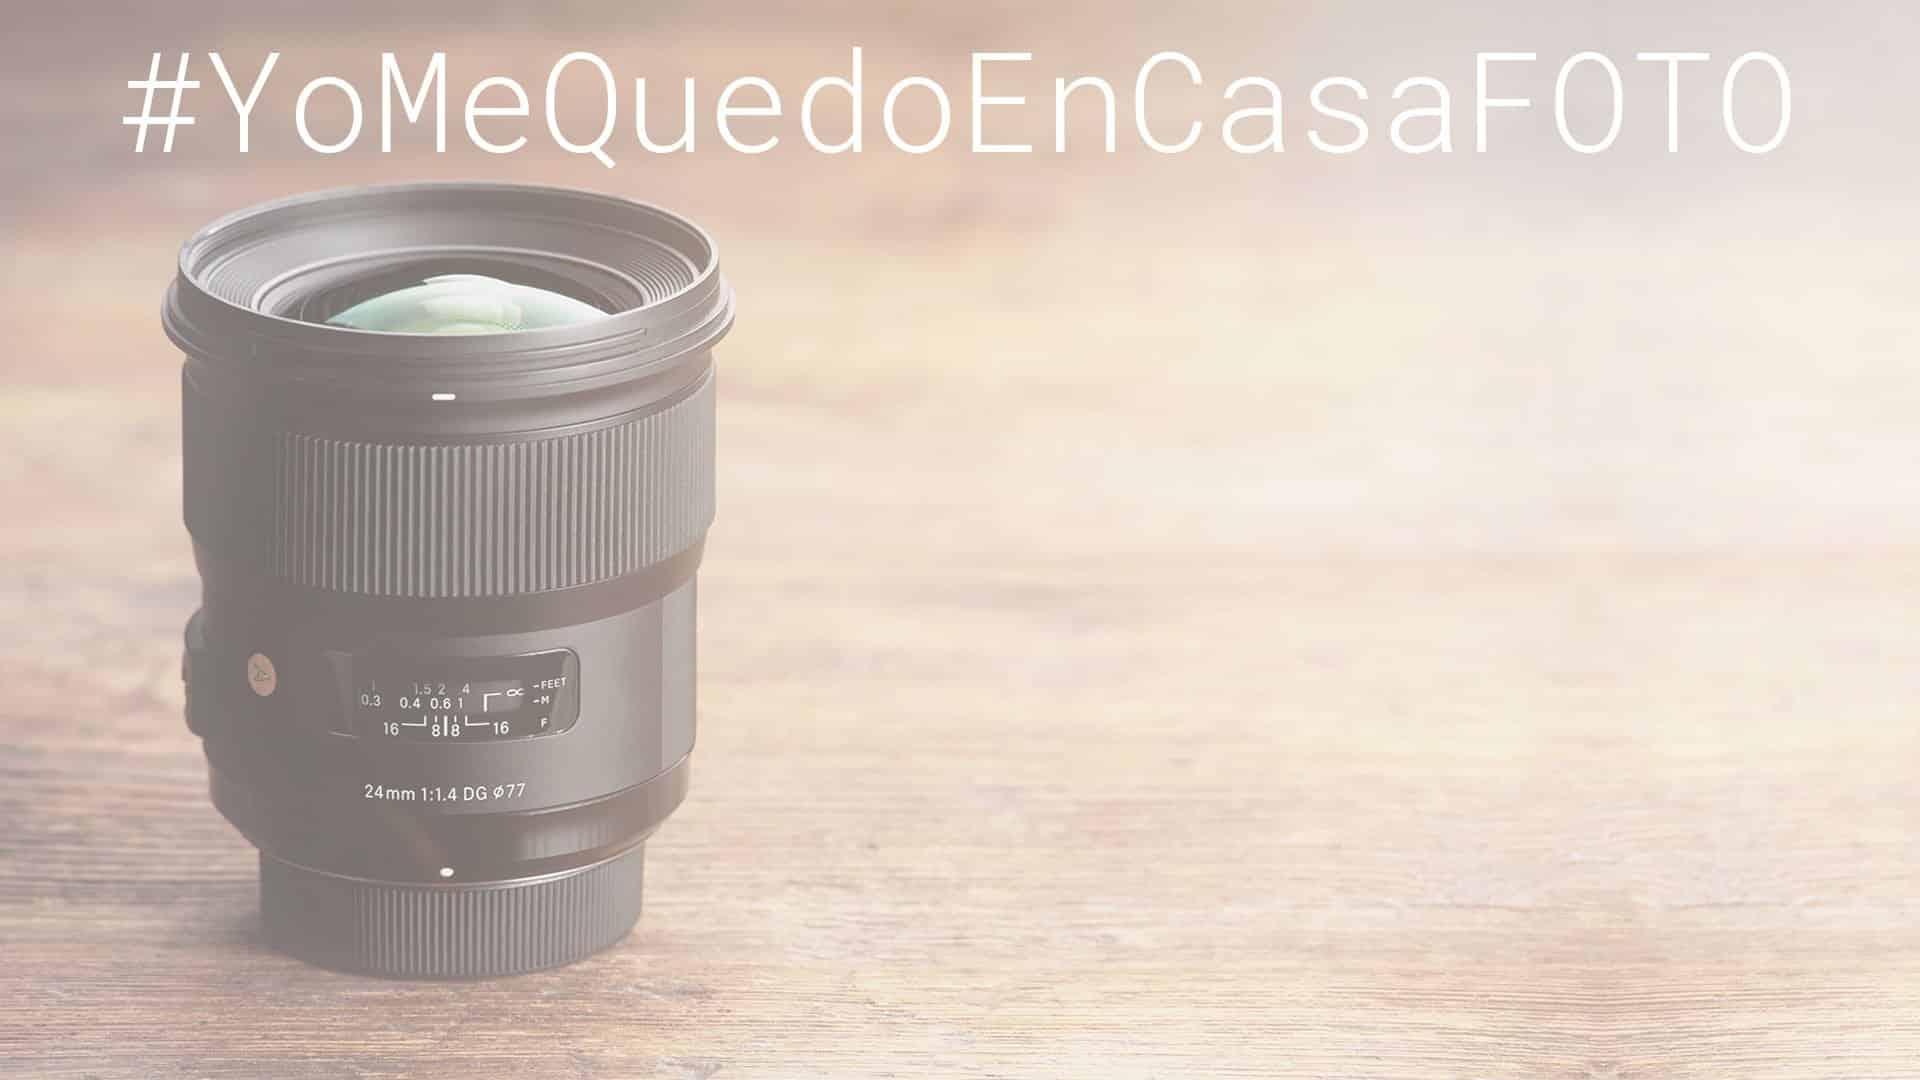 YoMeQuedoEnCasaFOTO